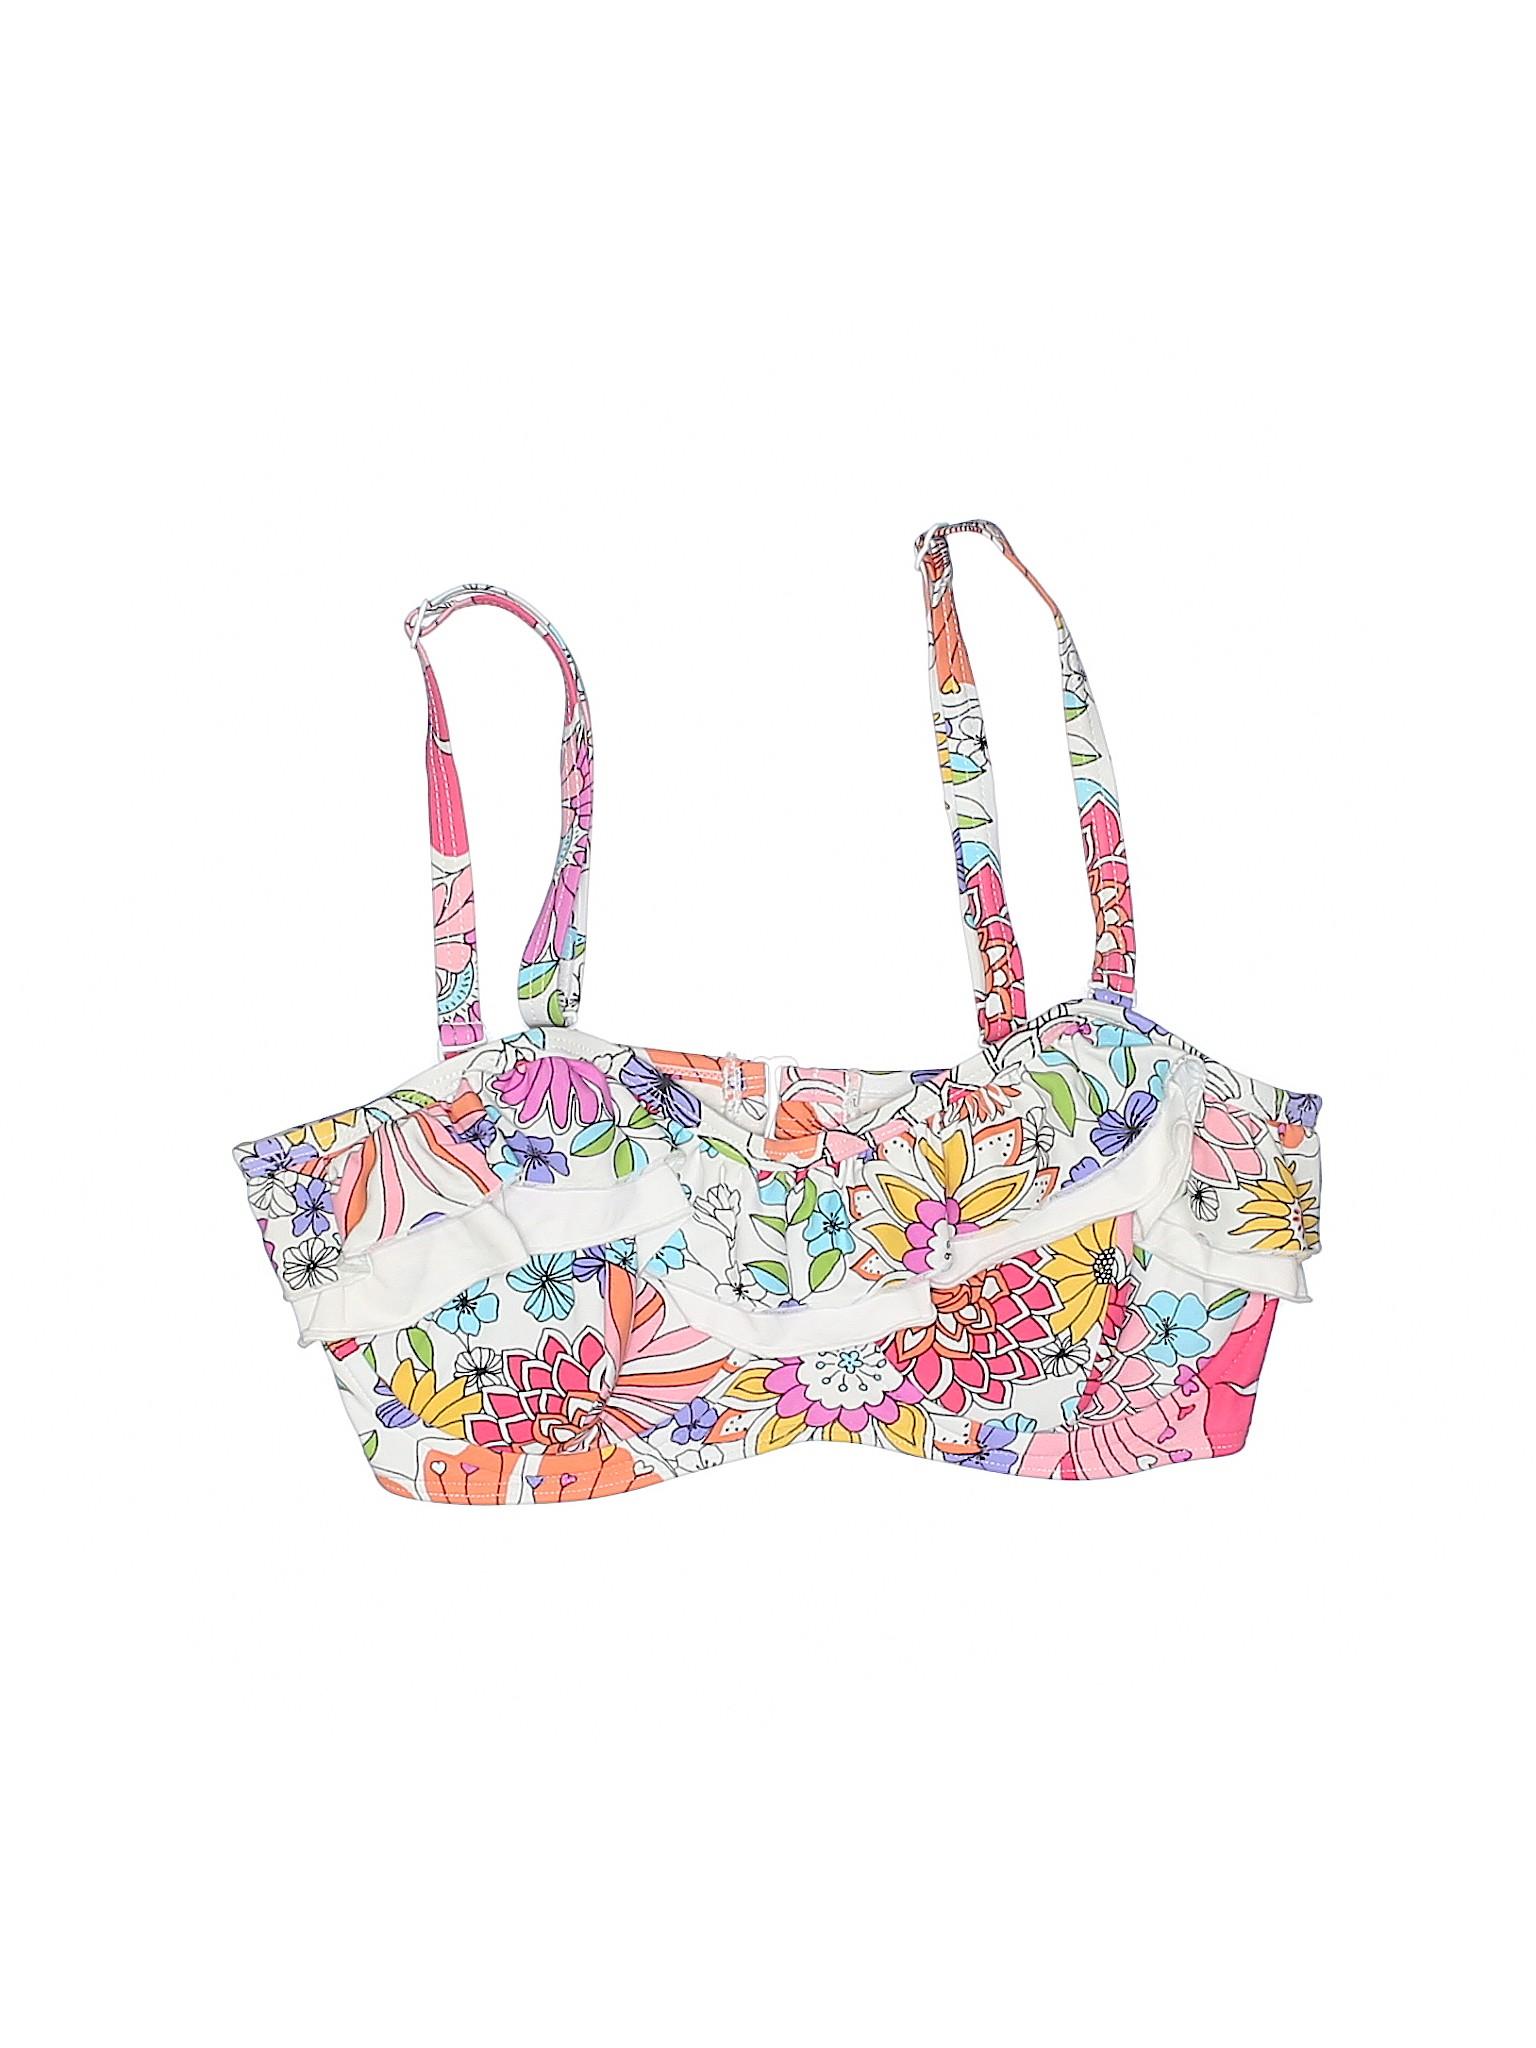 Boutique Boutique Boutique Rave Top Rave Coco Swimsuit Top Swimsuit Rave Swimsuit Top Coco Coco qzTCZAw